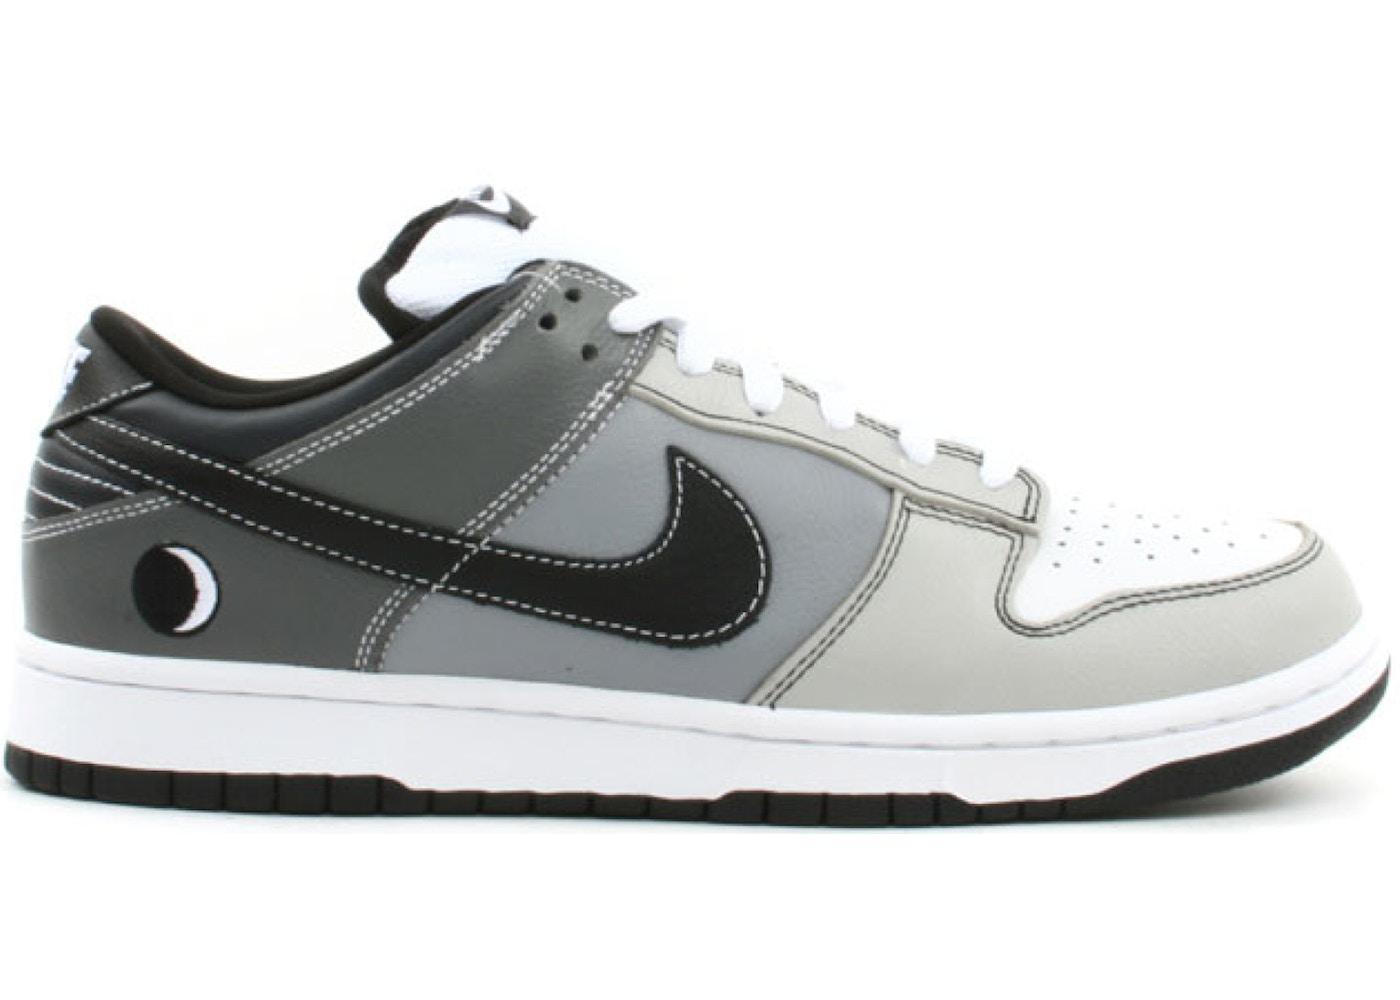 quality design 957e3 f3118 Nike SB Dunk Low Lunar Eclipse (West) - 313170-002